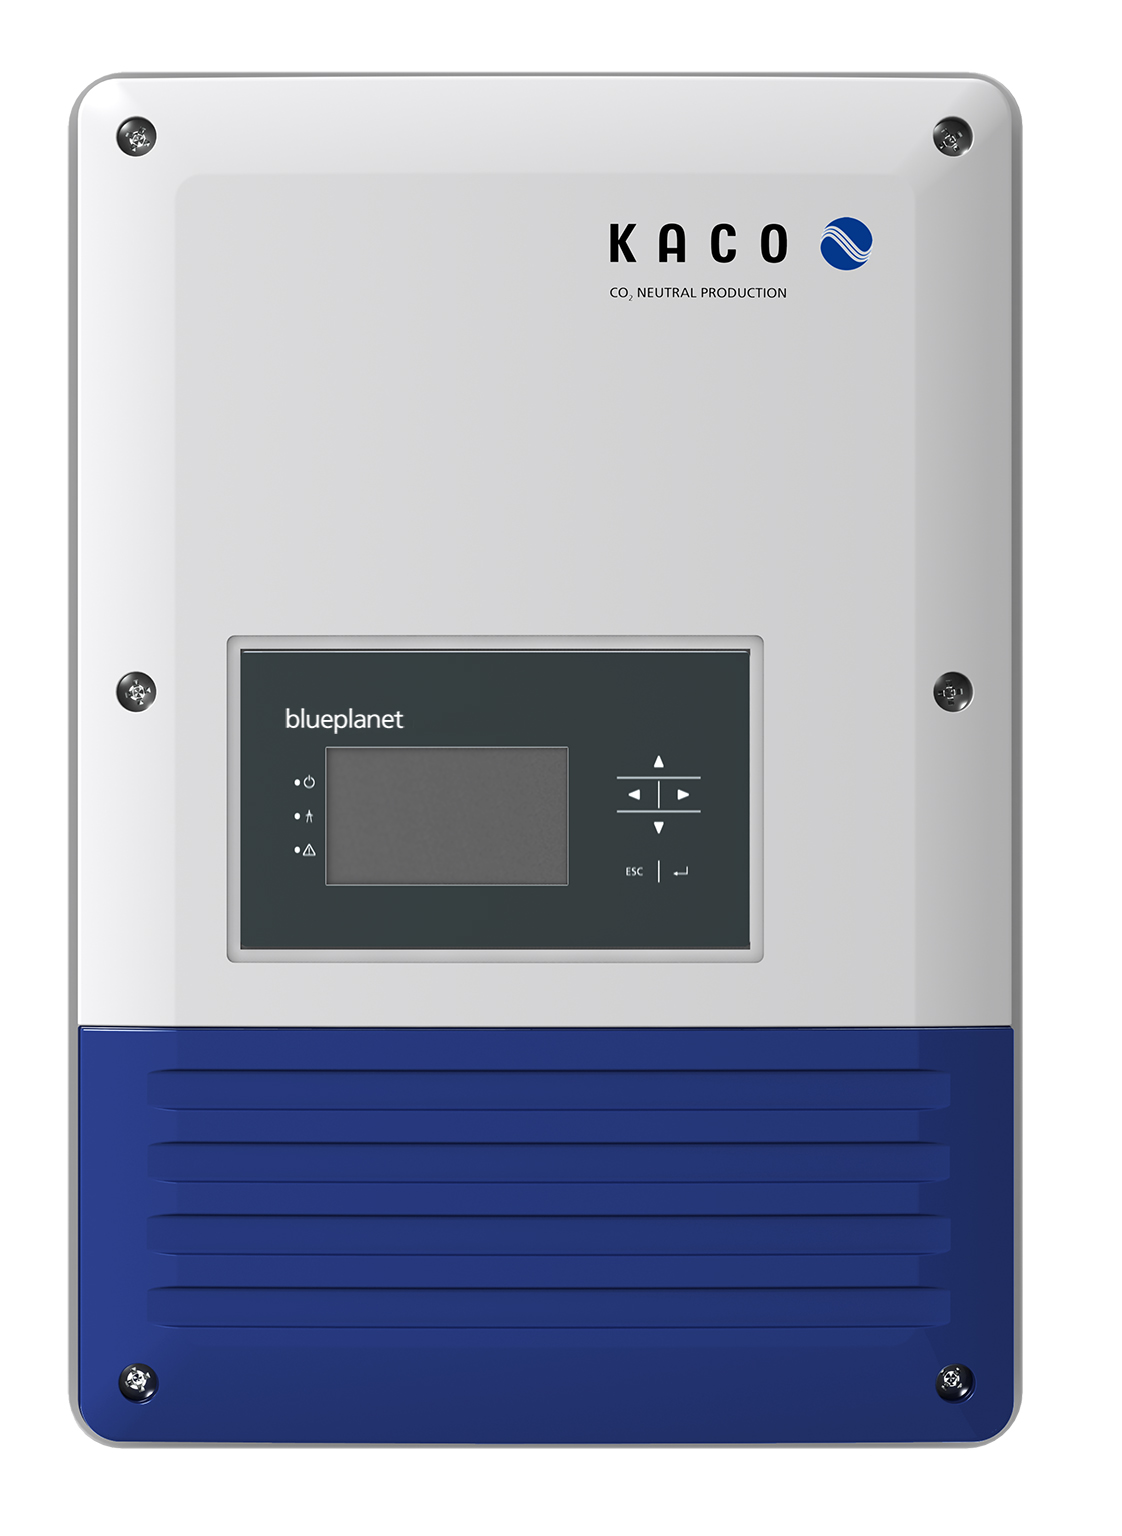 1 Stk Kaco blueplanet 7.5 TL3 3ph IP65 2 MPP-Tracker  PVI50075--